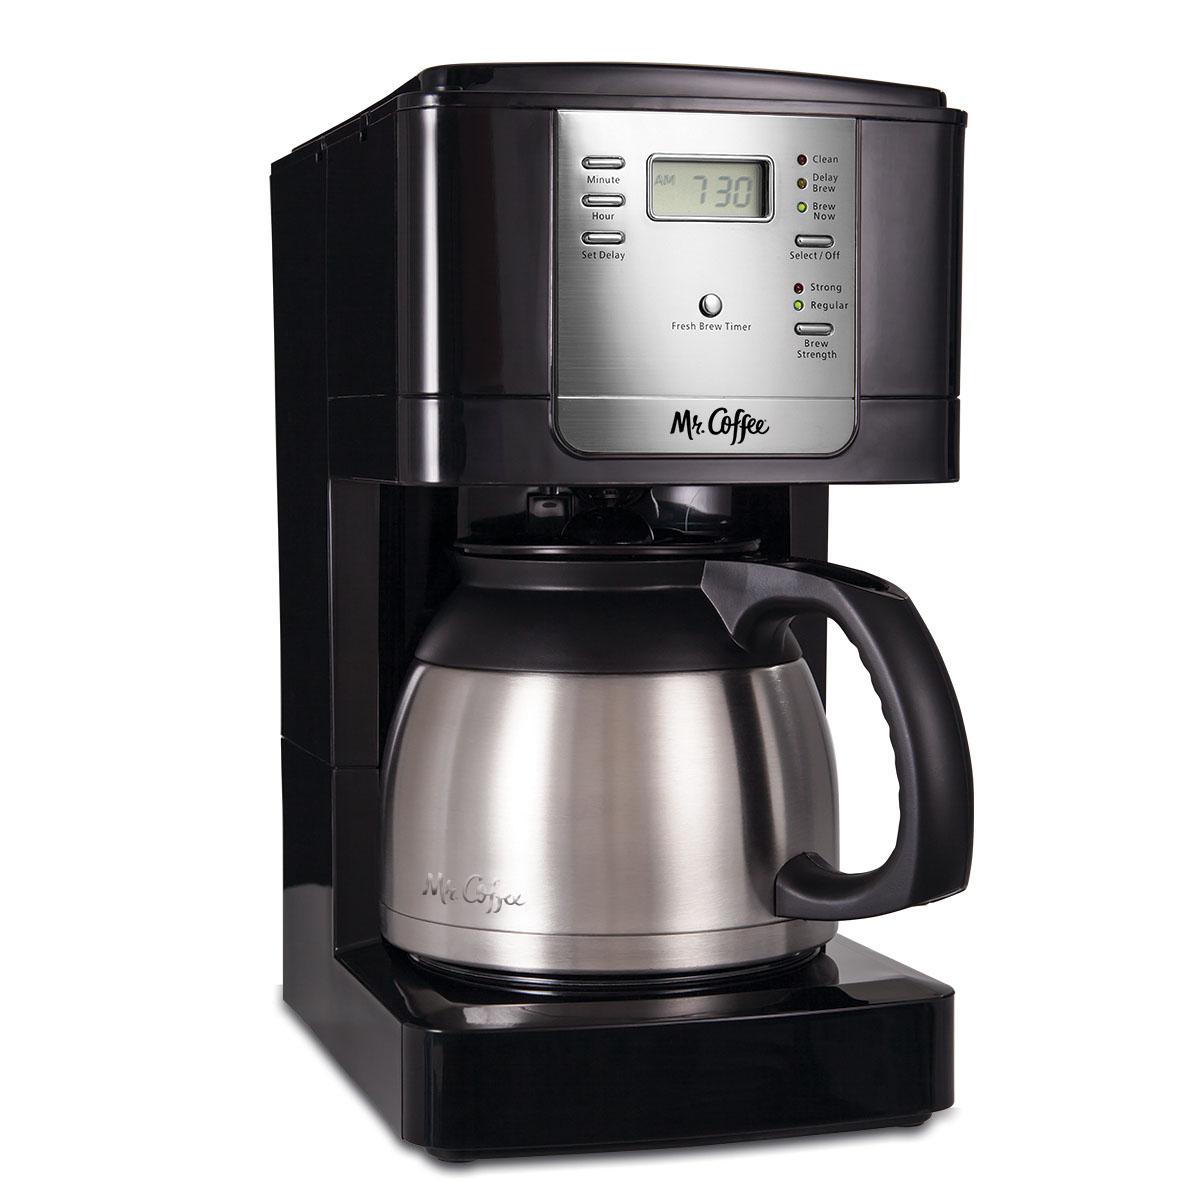 Mr. Coffee JWTX85 - Reviews, Prices, Specs - www.bestadvisor.com